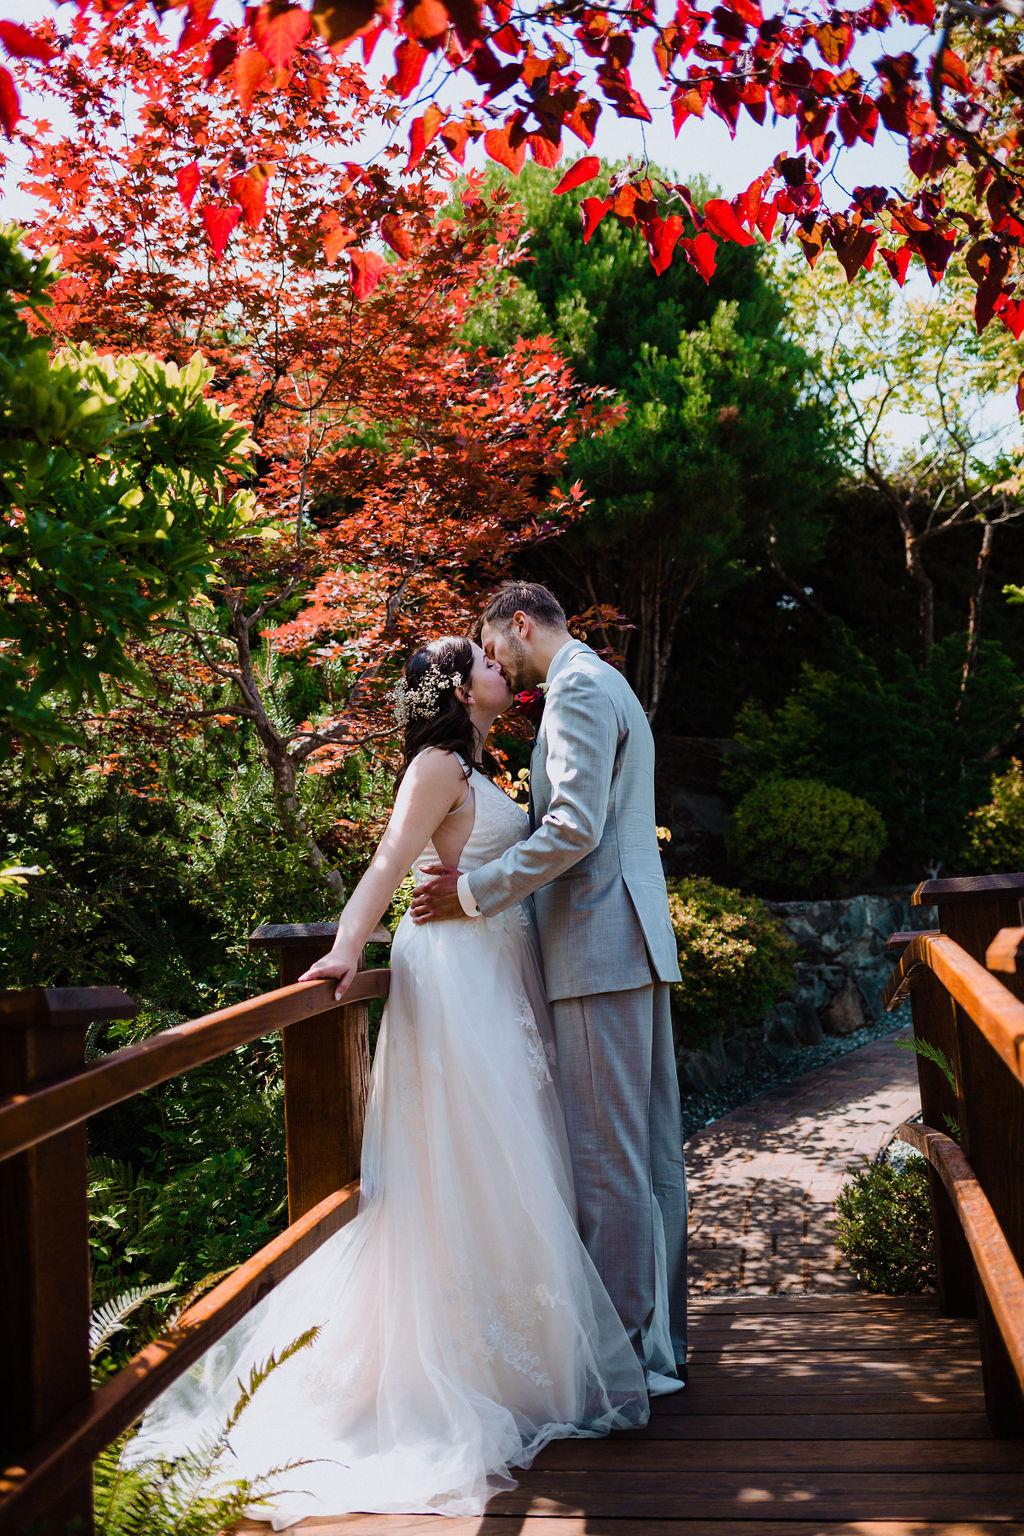 Happily Ever After Newlyweds kiss on Arbutus Ridge Garden Bridge on Vancouver Island